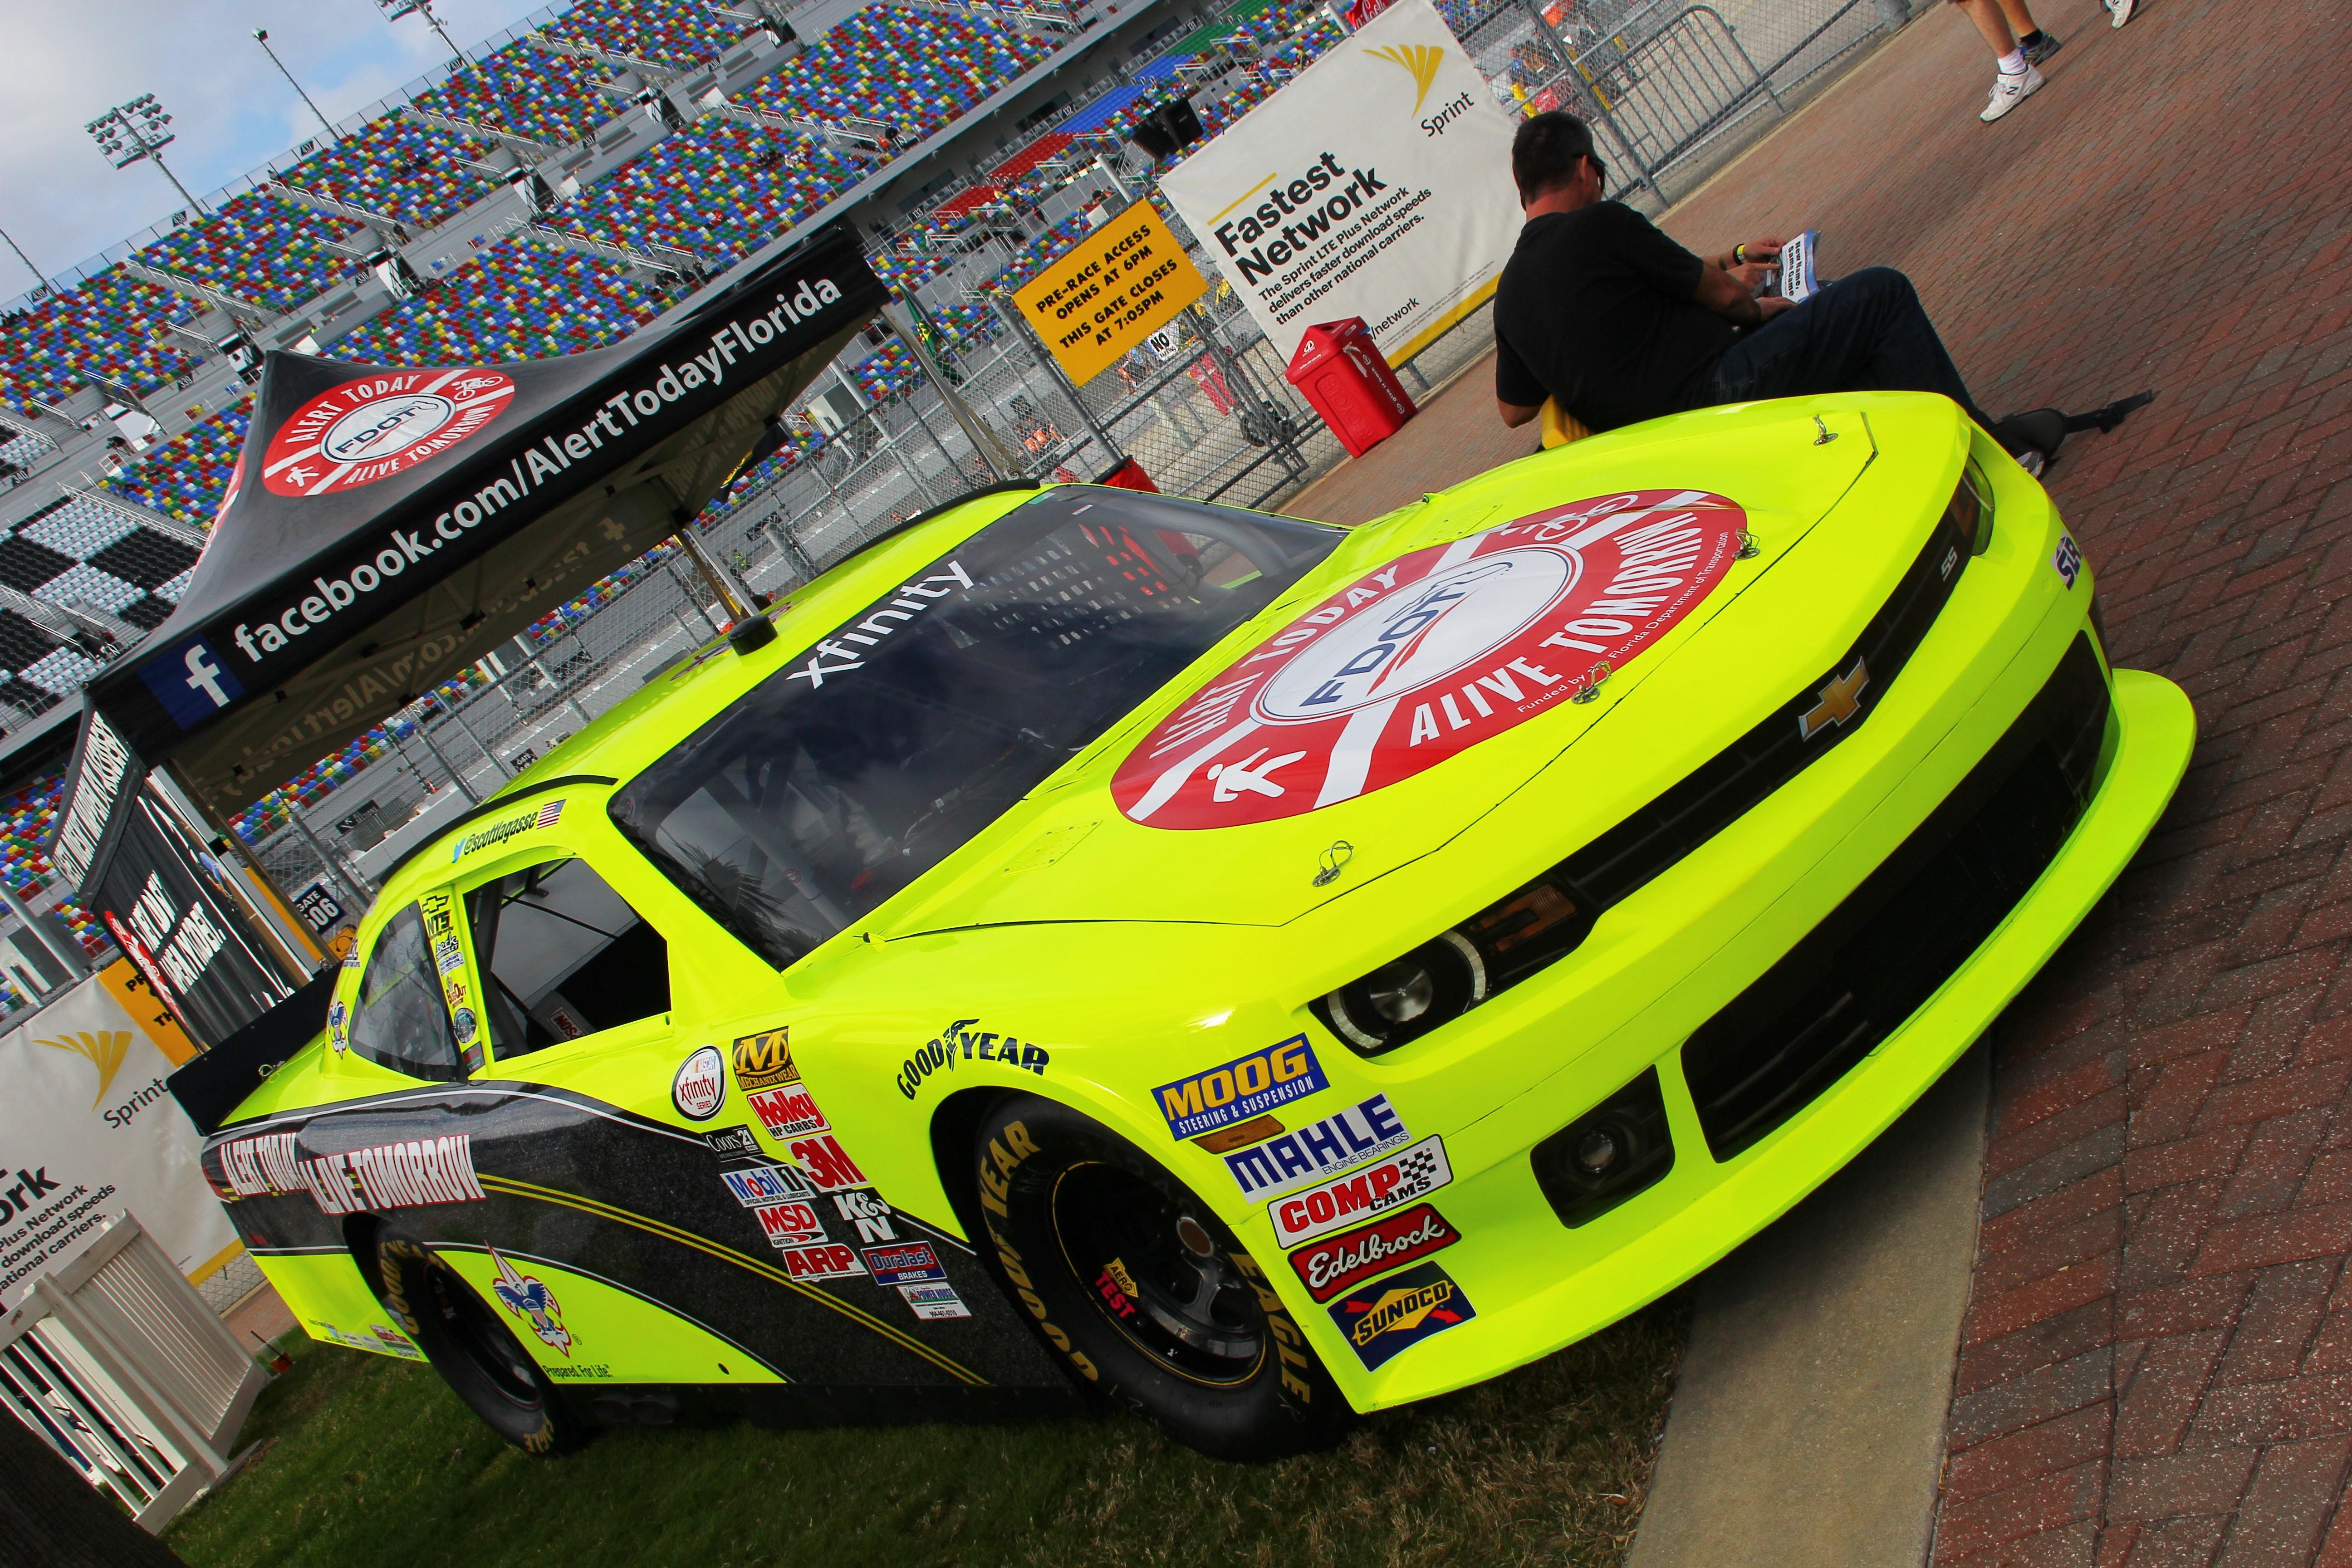 IMG_9260 – RacingJunk News